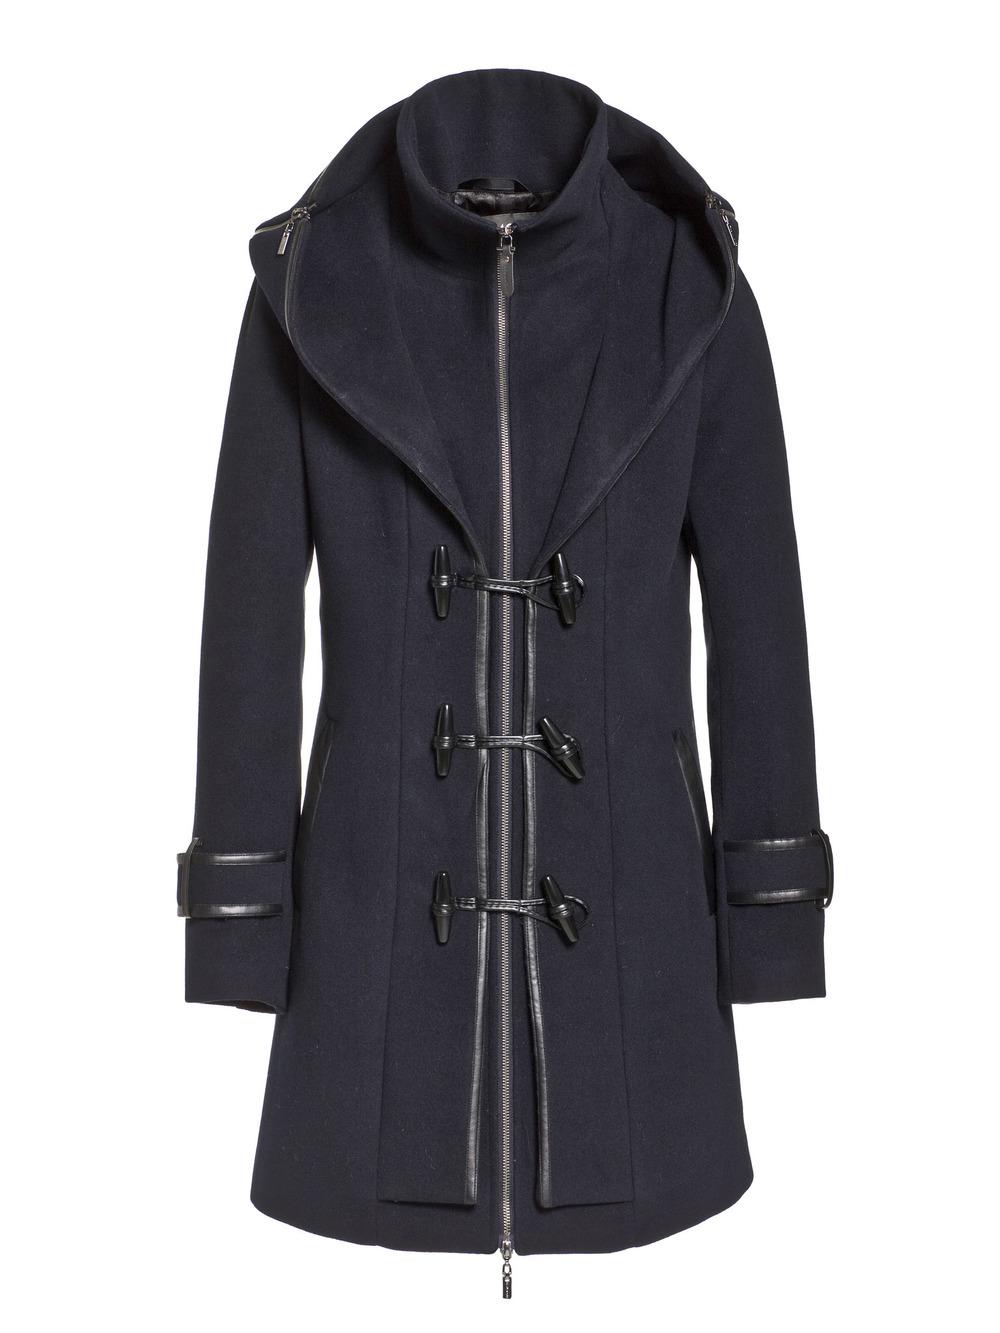 Beaumont Duffle coat i Navy